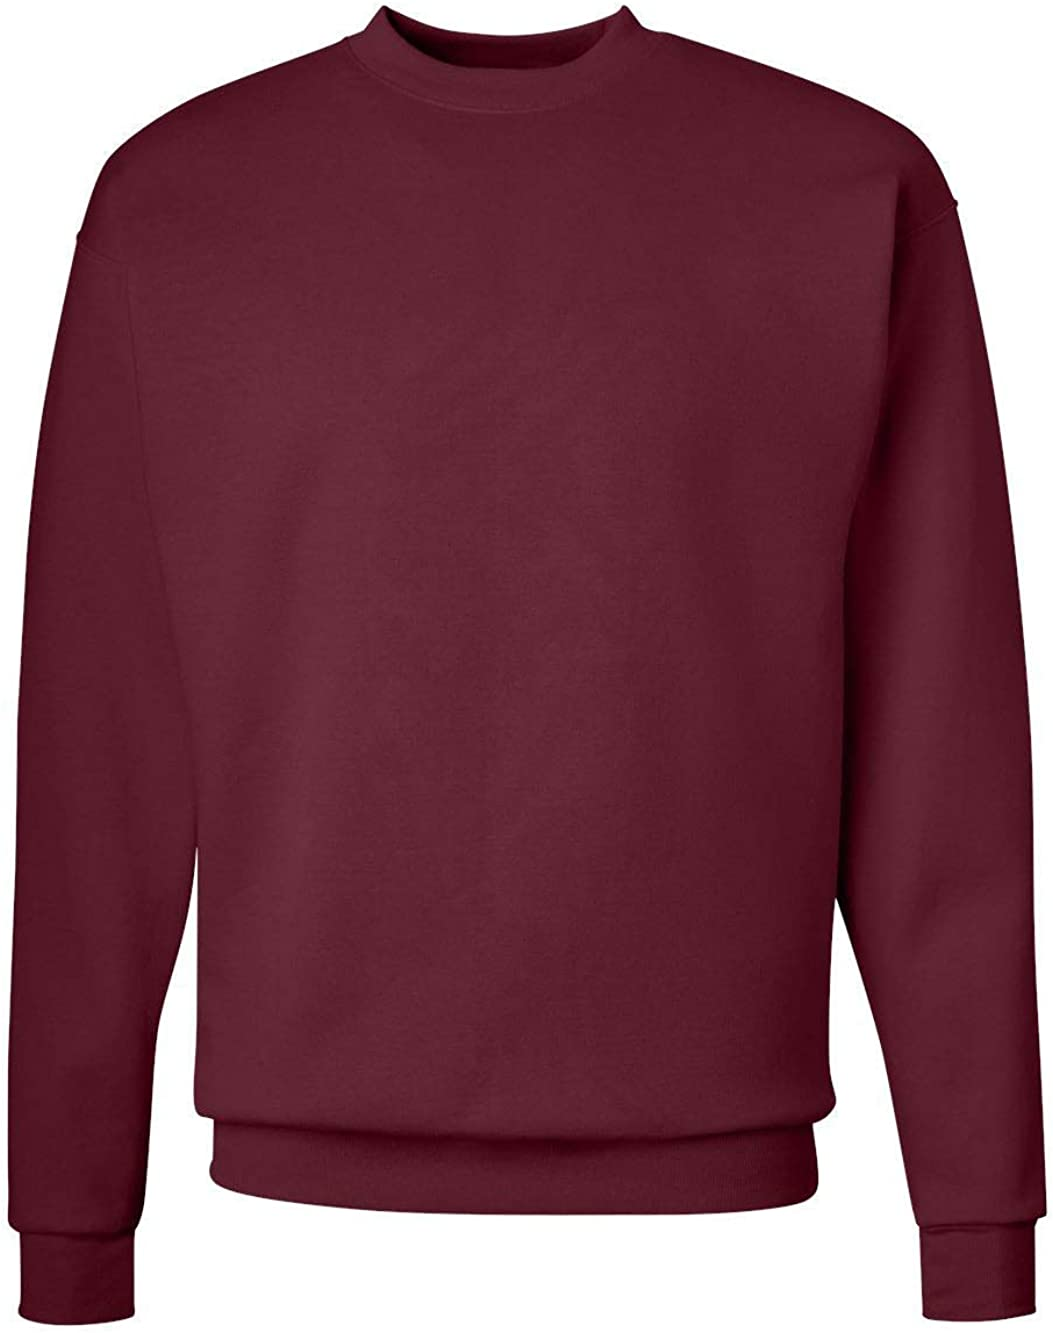 Hanes ComfortBlend EcoSmart Crew Sweatshirt_Cardinal_4XL